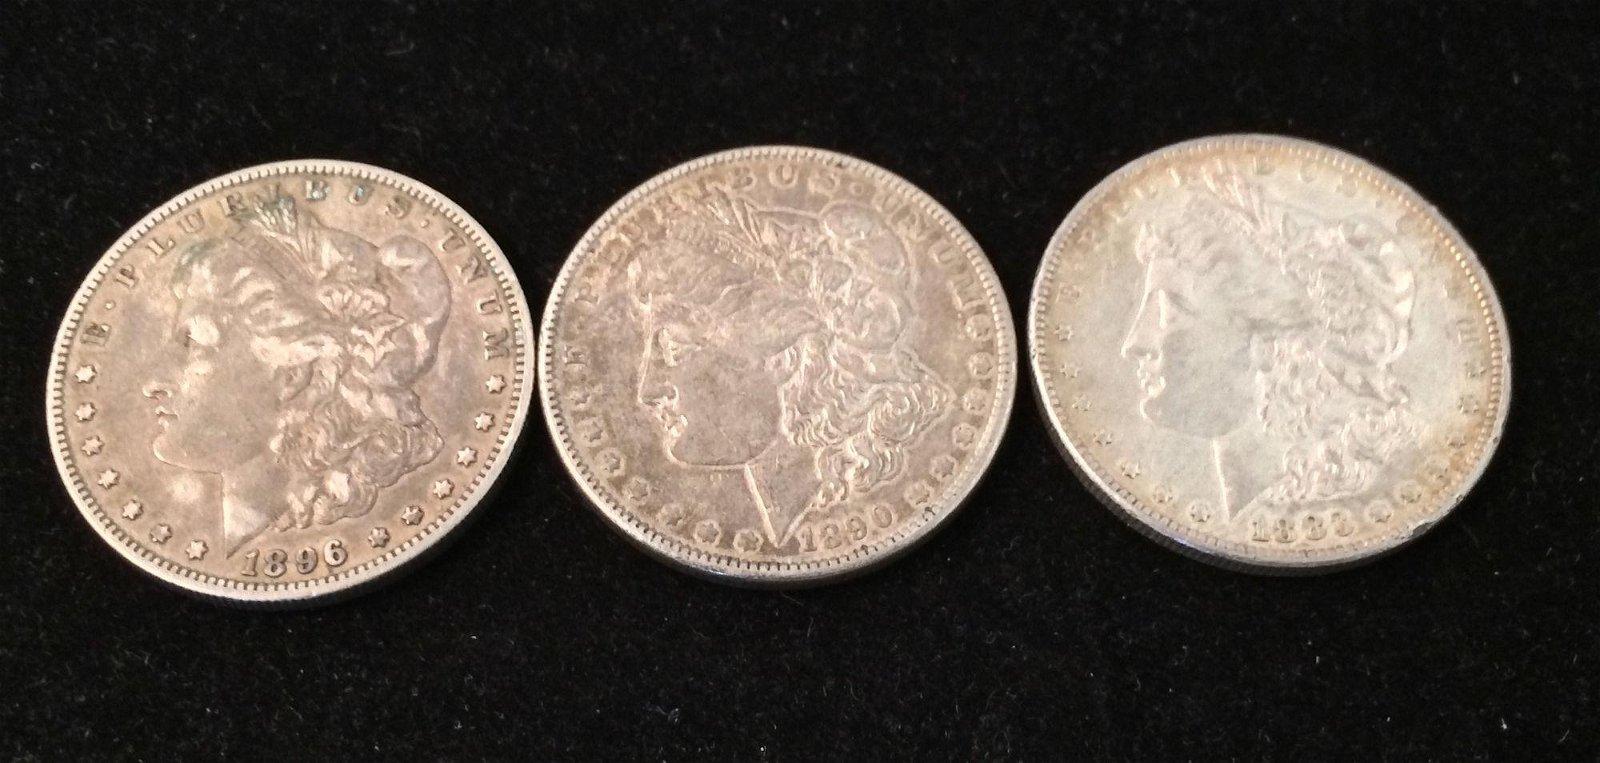 3 U.S. MORGAN SILVER DOLLARS 1883, 1890, AND 1896O *tax